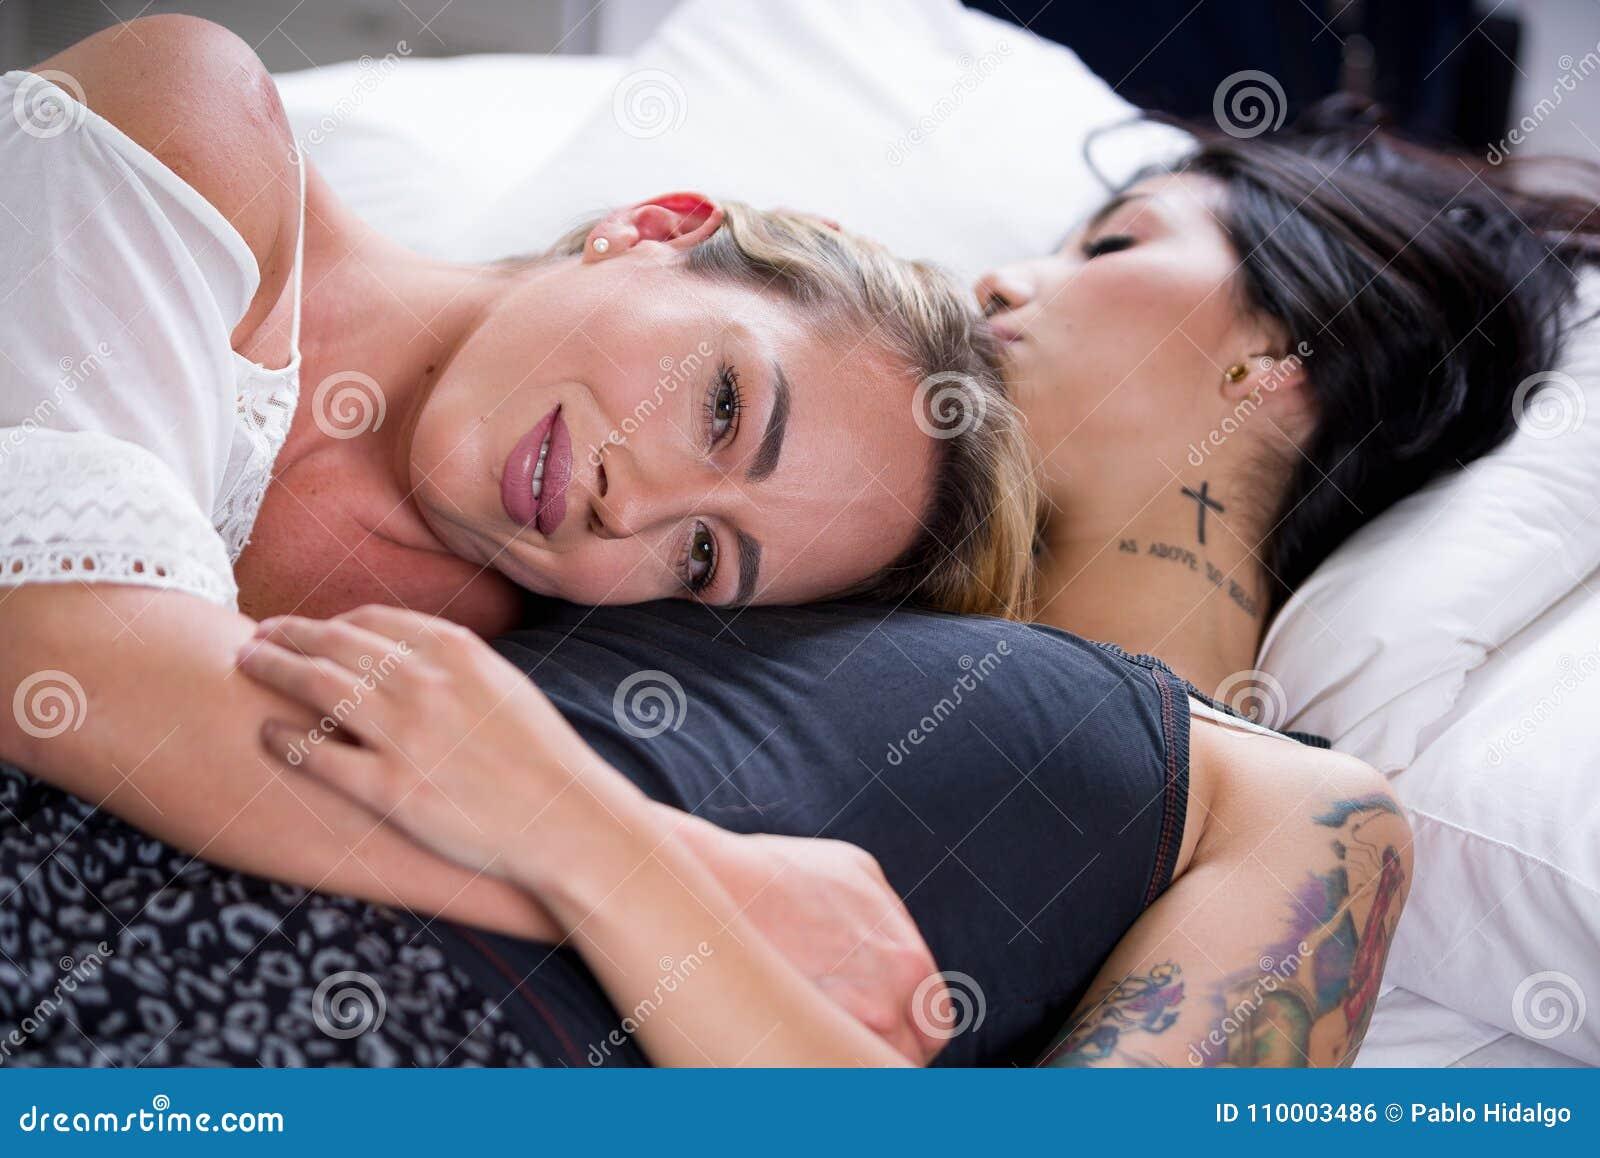 Right! seems Lesbianas en la cama matchless phrase